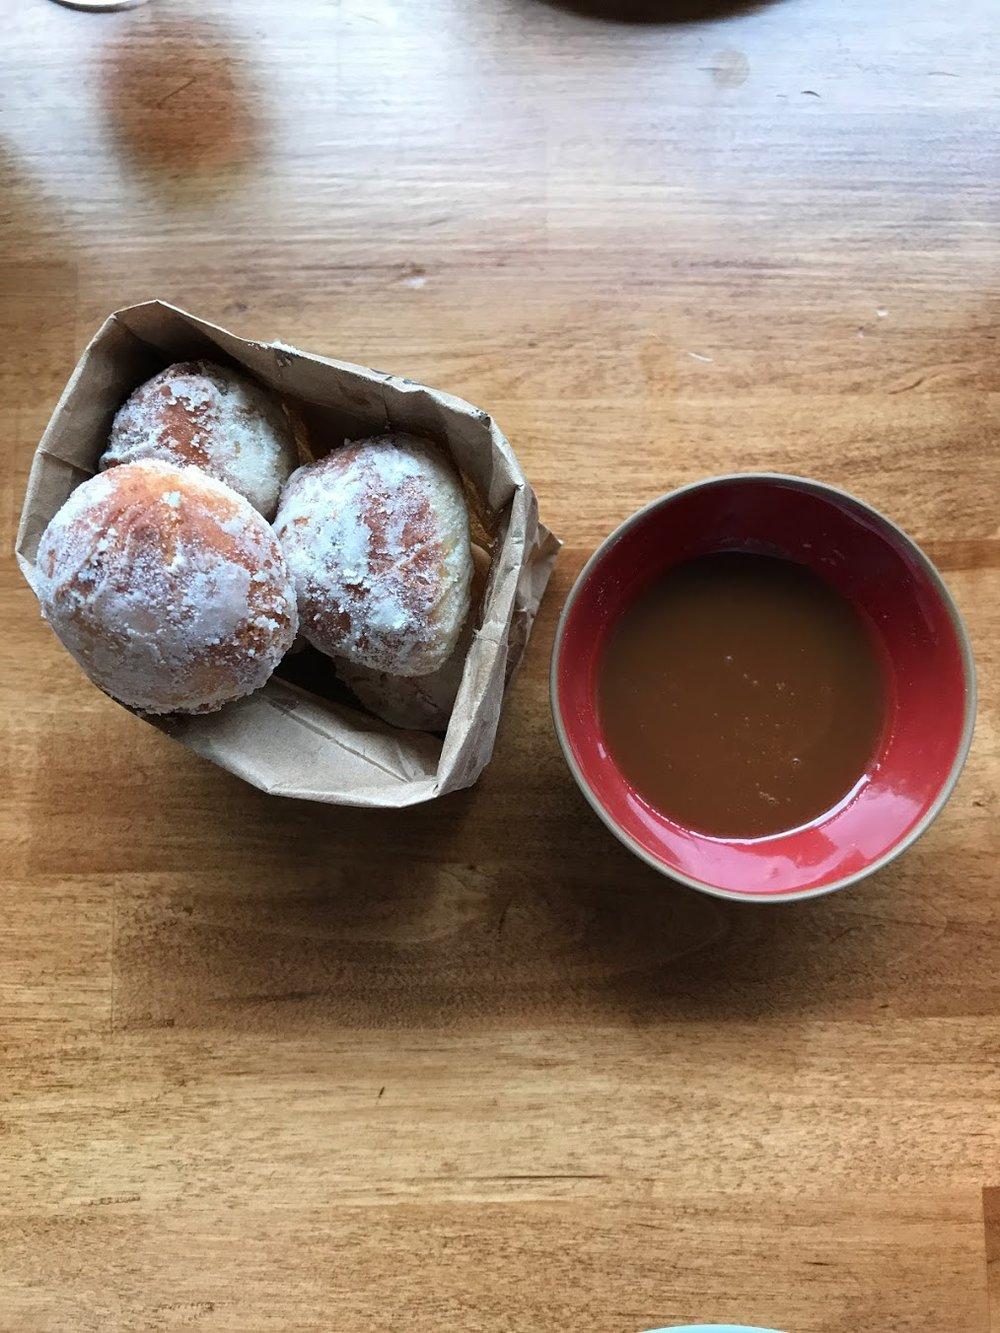 Obligatory donuts